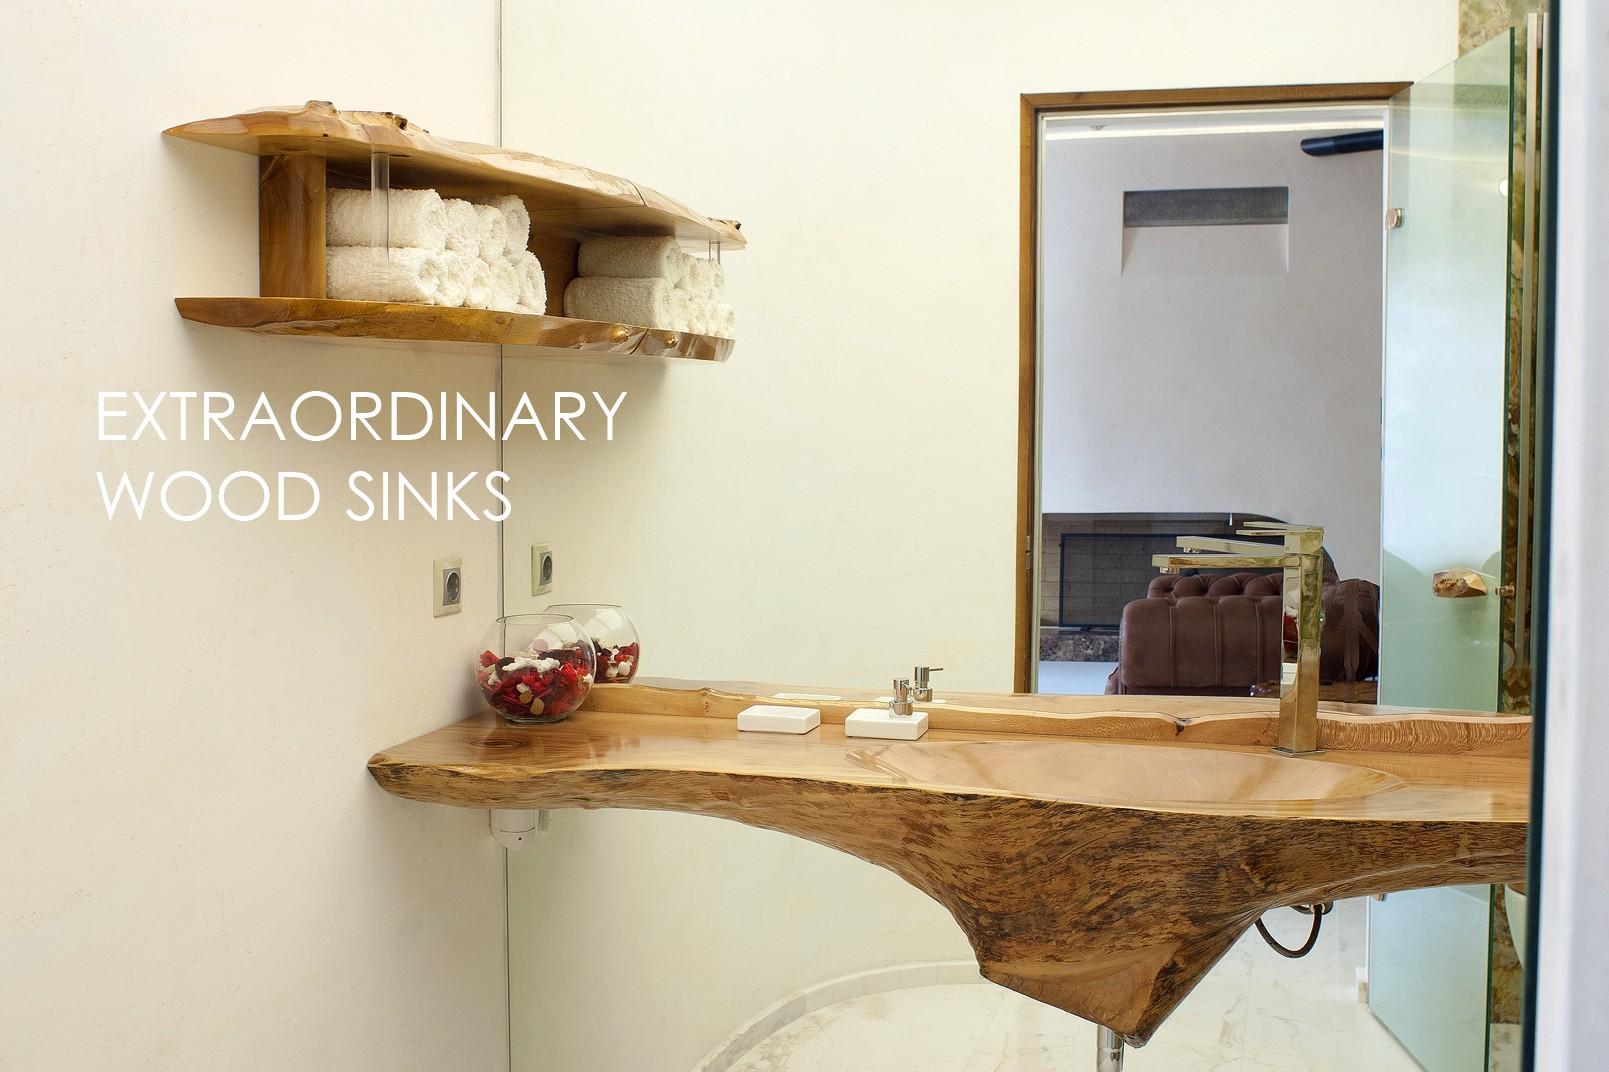 Wood sinks for extraordinary interior design